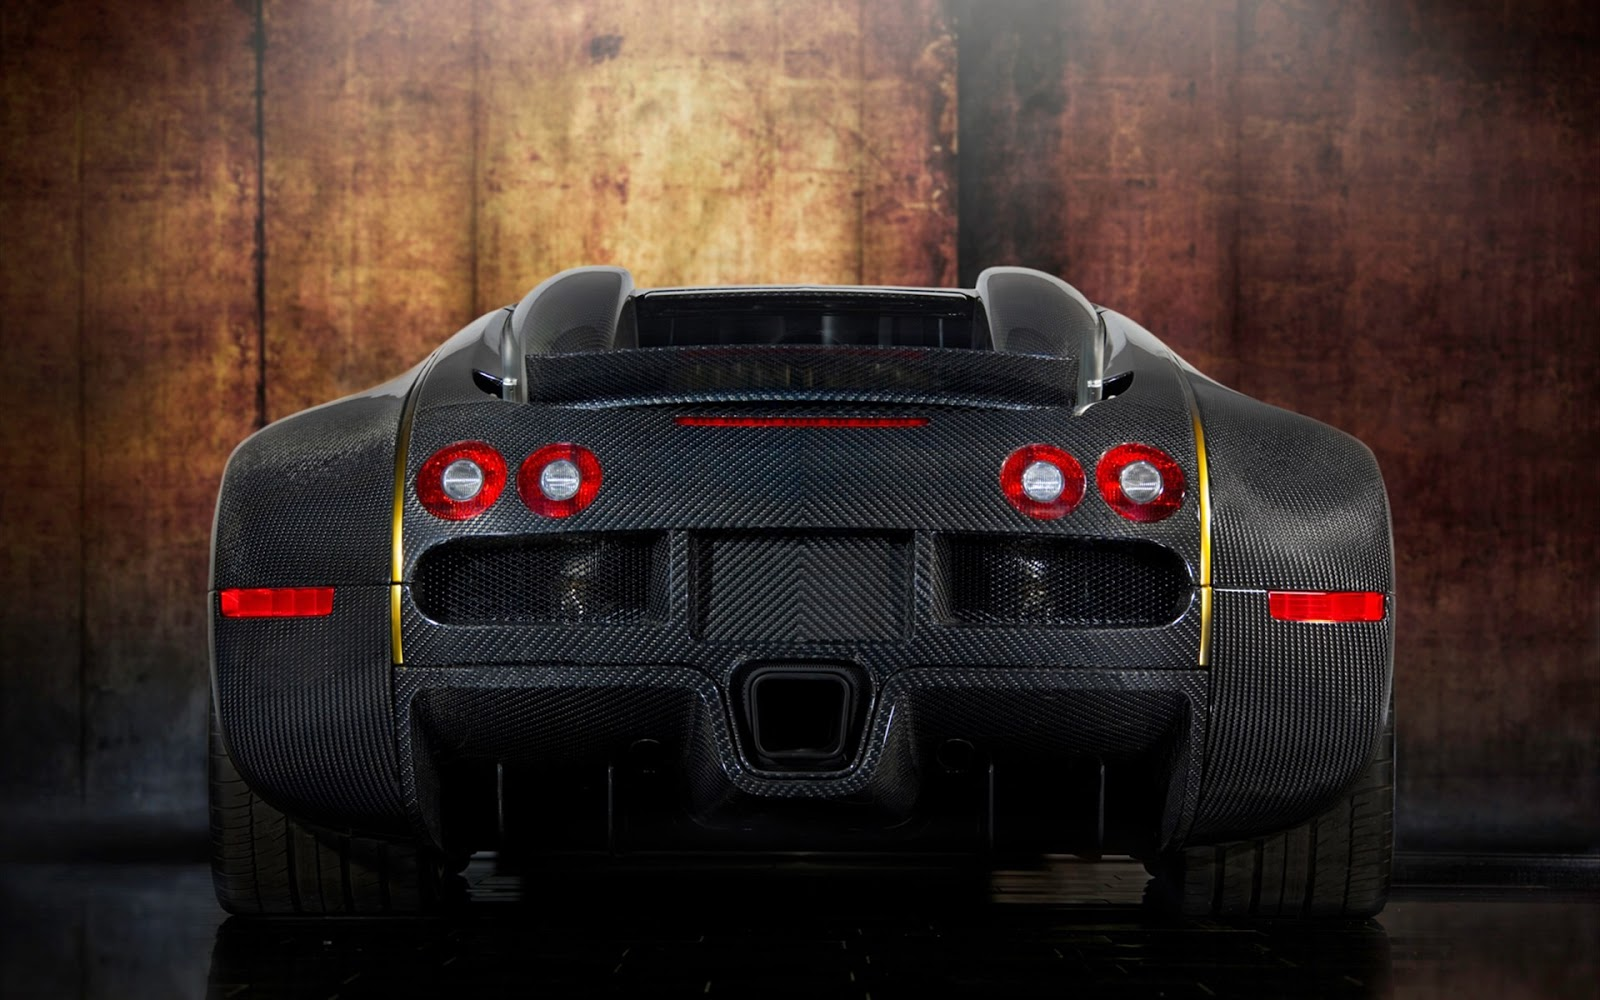 http://3.bp.blogspot.com/-gF49P2eGevA/UHplvf0PqOI/AAAAAAAAGT8/gnY3gtWfJZ0/s1600/cars-bugatti-veyron-supercars-mansory-HD-Wallpapers.jpg